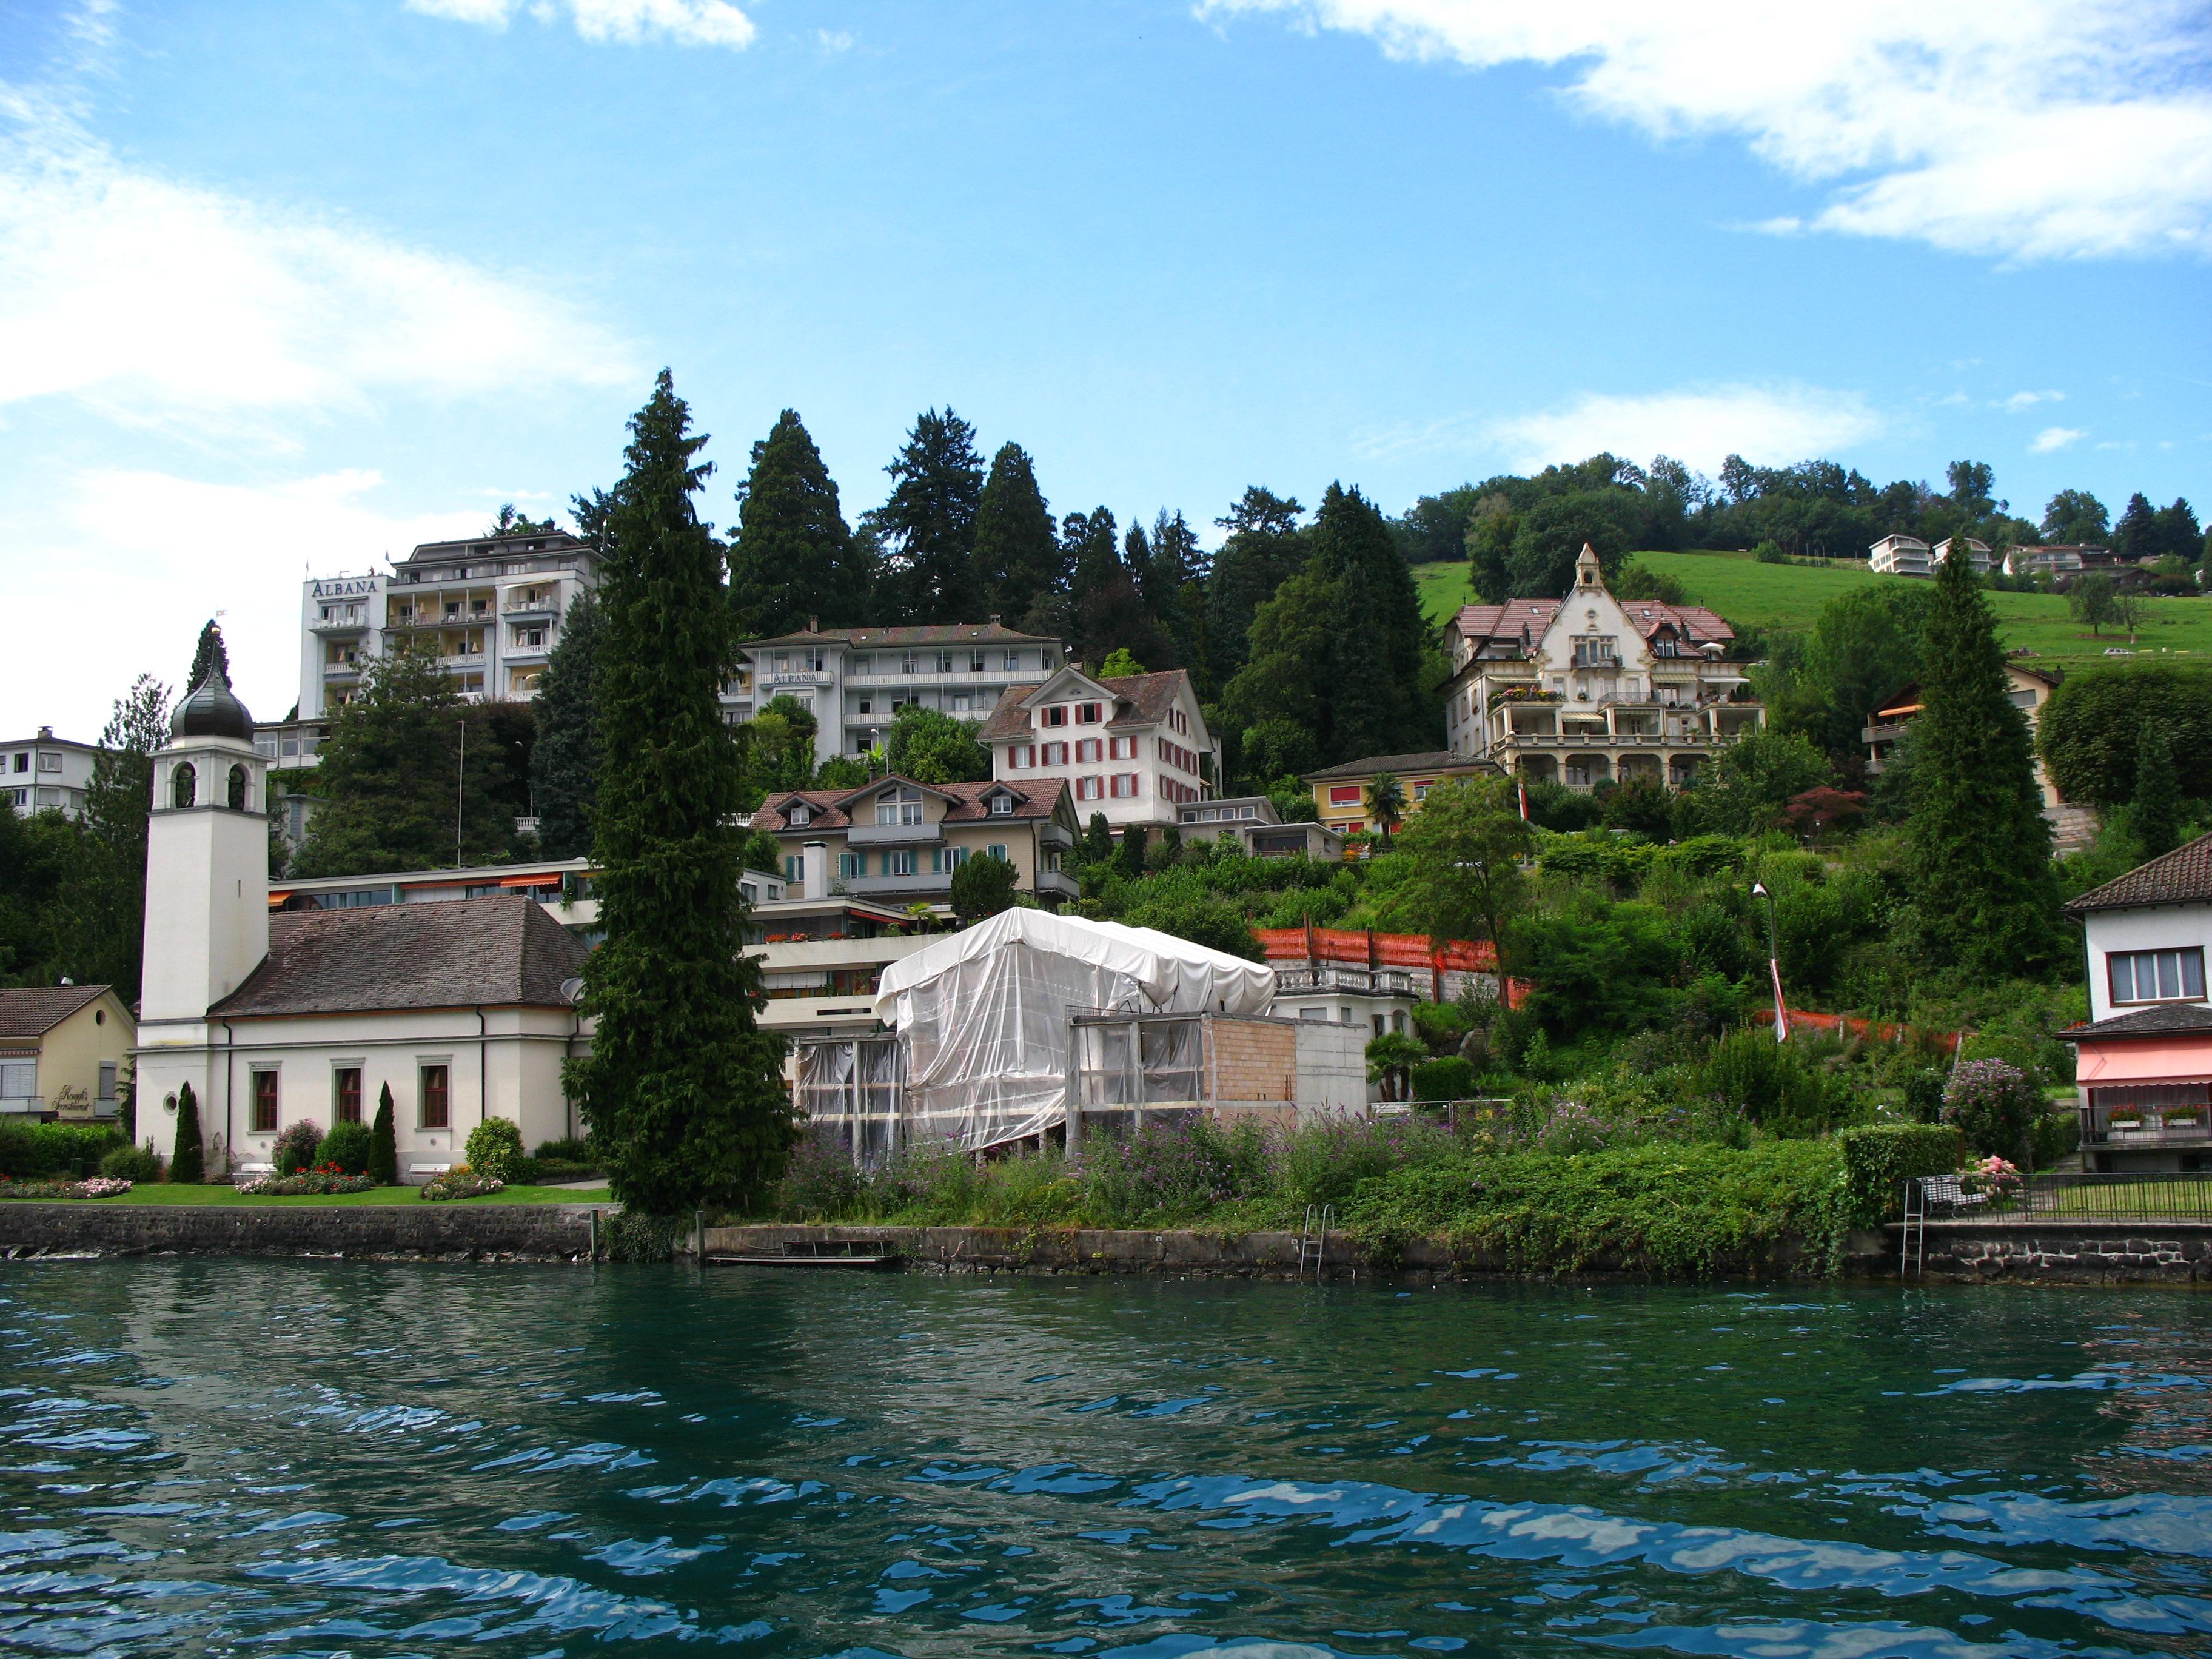 Weggis Switzerland  city photos gallery : 6596 Weggis Church Wikimedia Commons